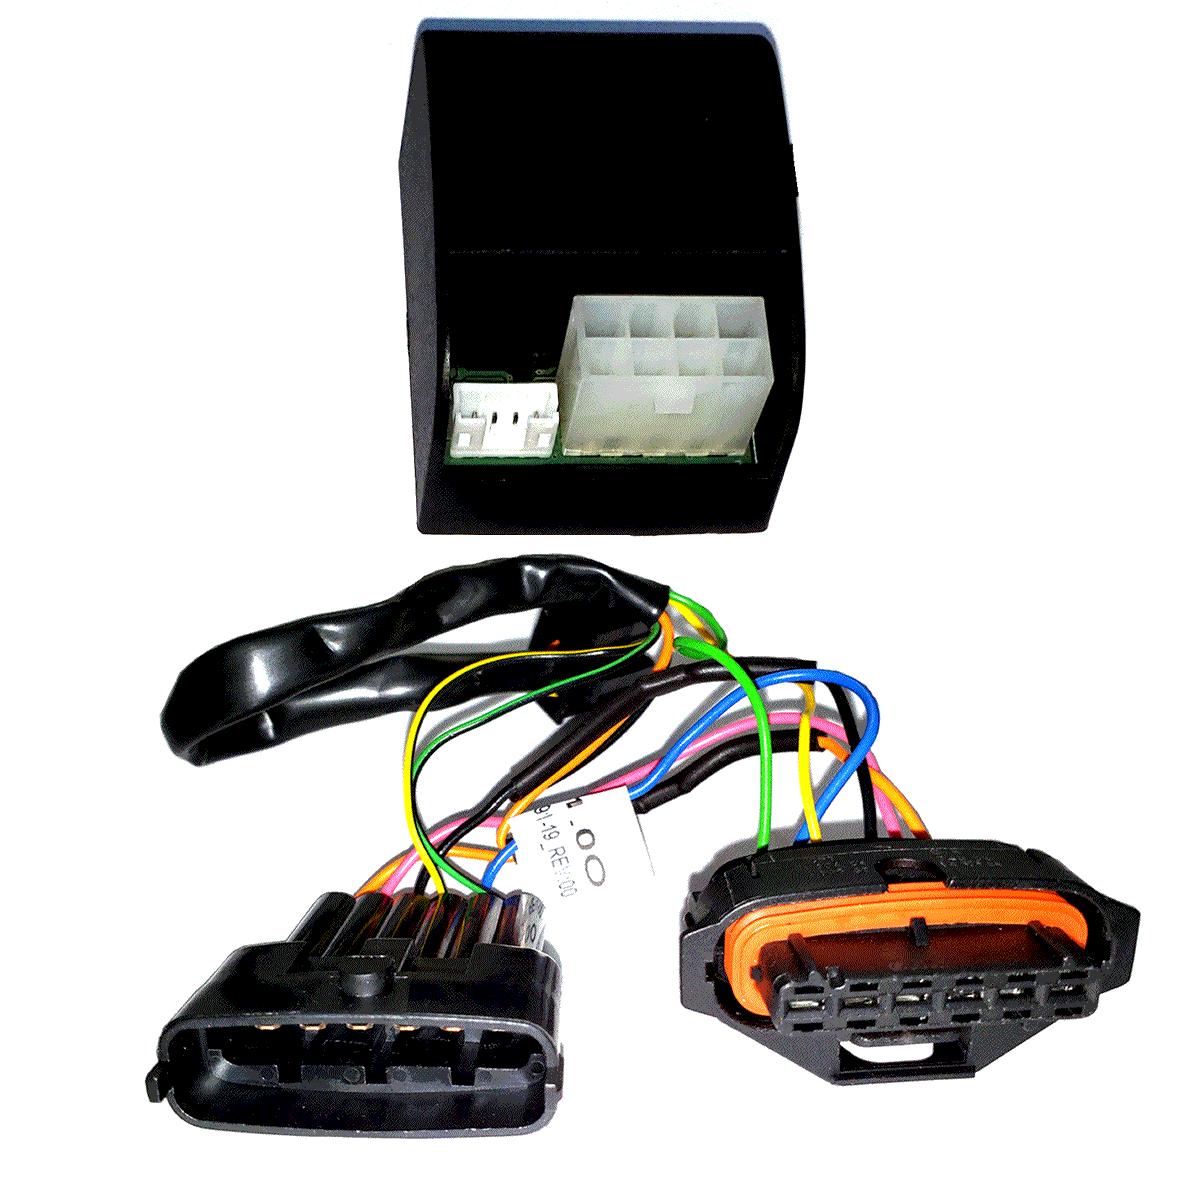 Variador T47 O Acelerador Eletrônico GNV Fiat Jac Kia VW Subaru Volvo ... TURY GAS